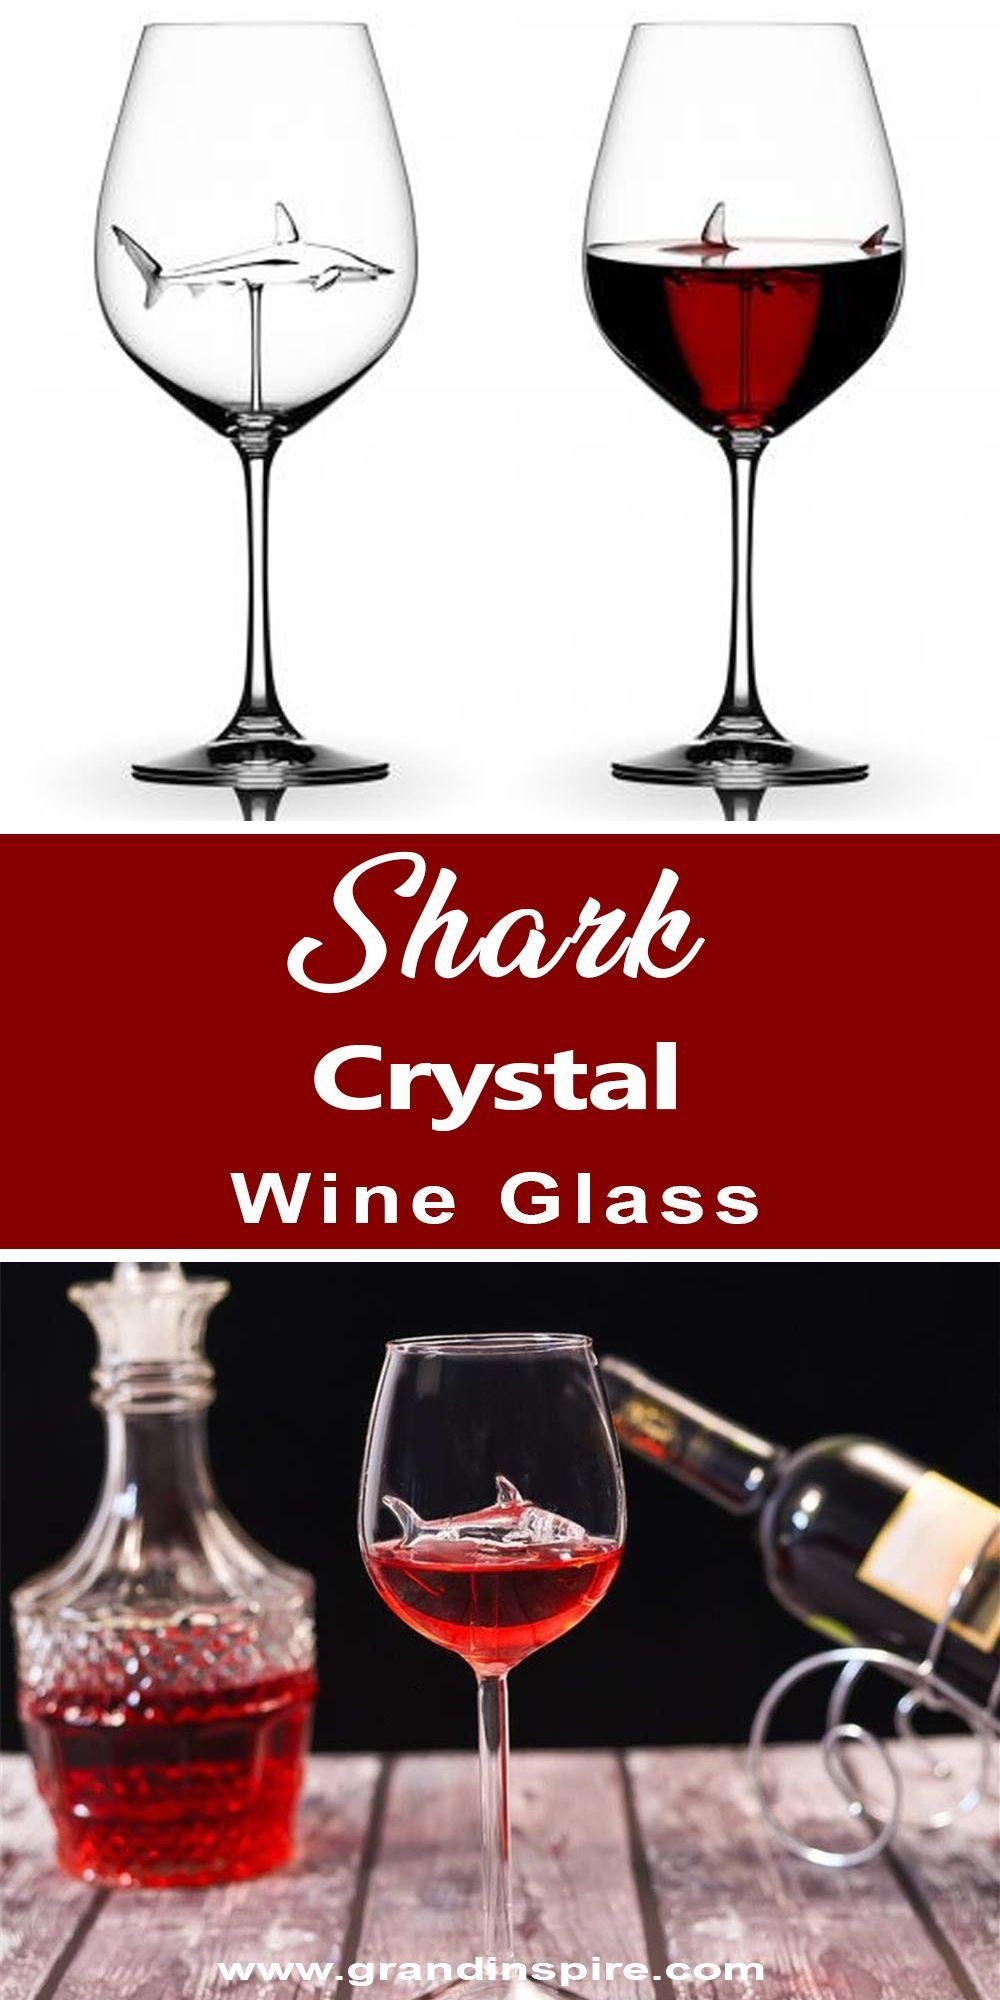 Crystal Glass Shark Valentinesdateathomedecor Wine 35 Shark Crystal Wine Glass 35 Shark Crystal Wine Glass Grand Inspire Gra In 2020 Wine Glass Wine Red Wine Cups